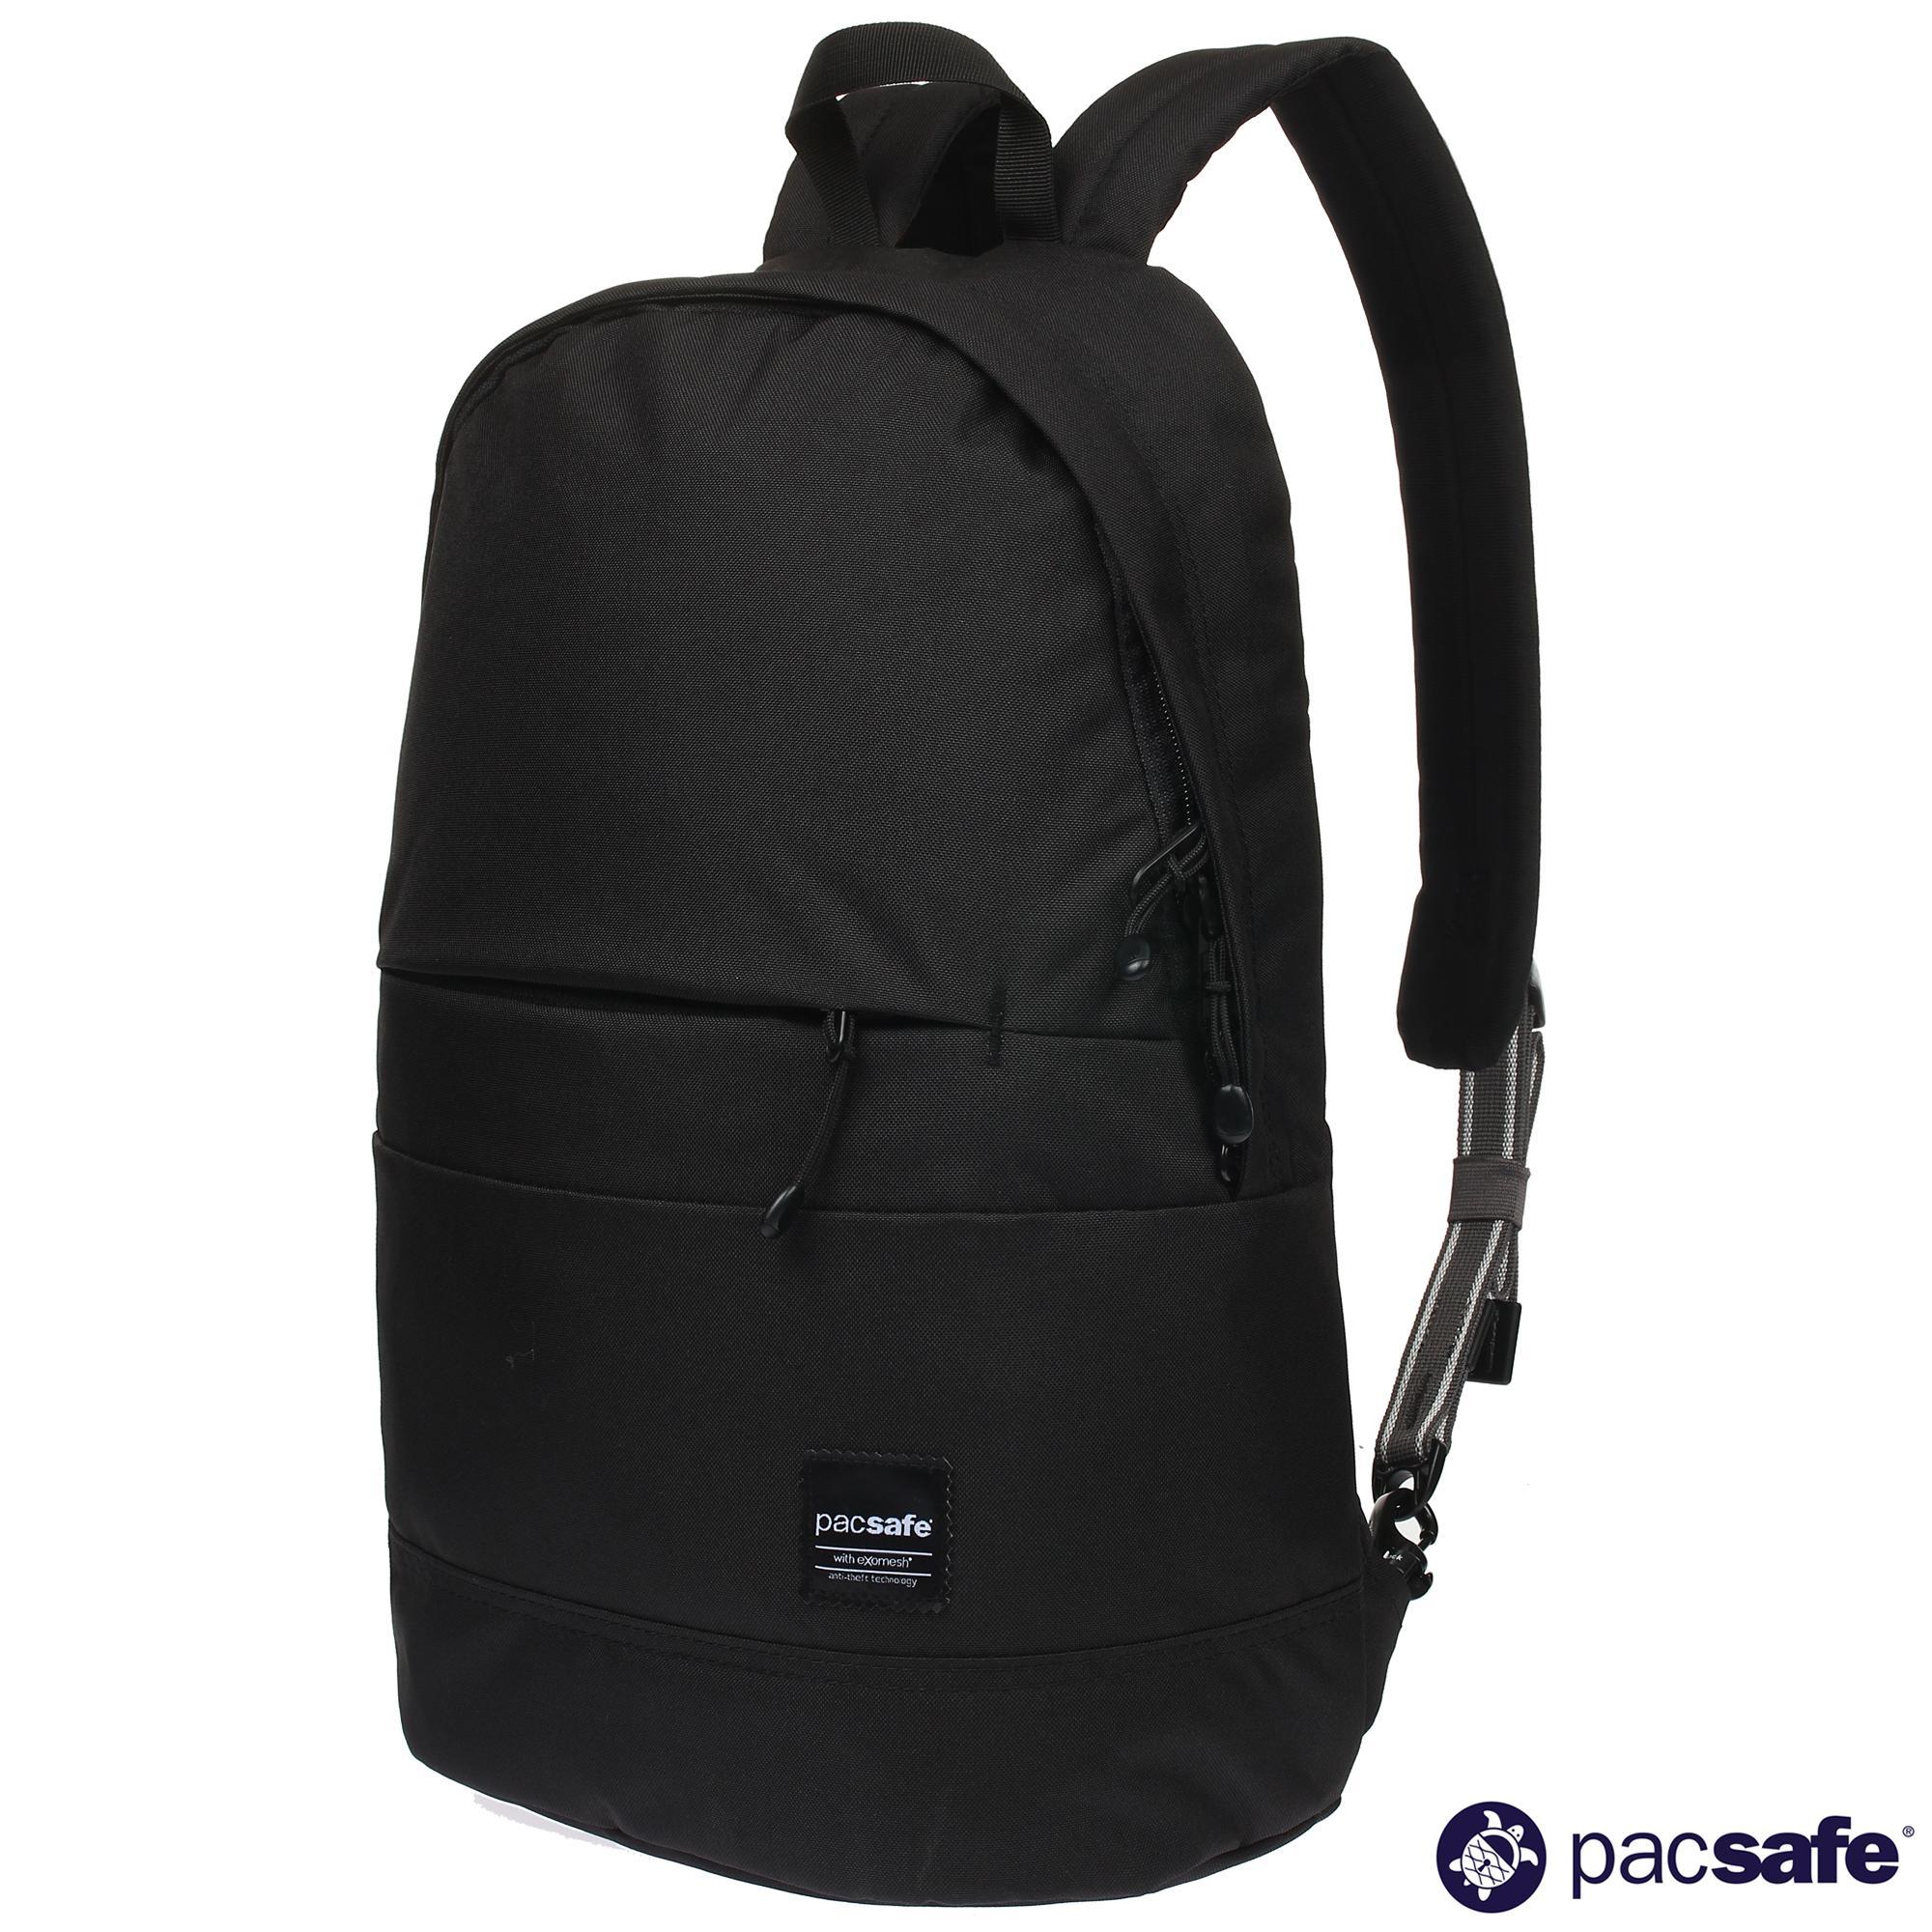 Pacsafe Slingsafe Lx300 Anti Theft Backpack 45230 Black